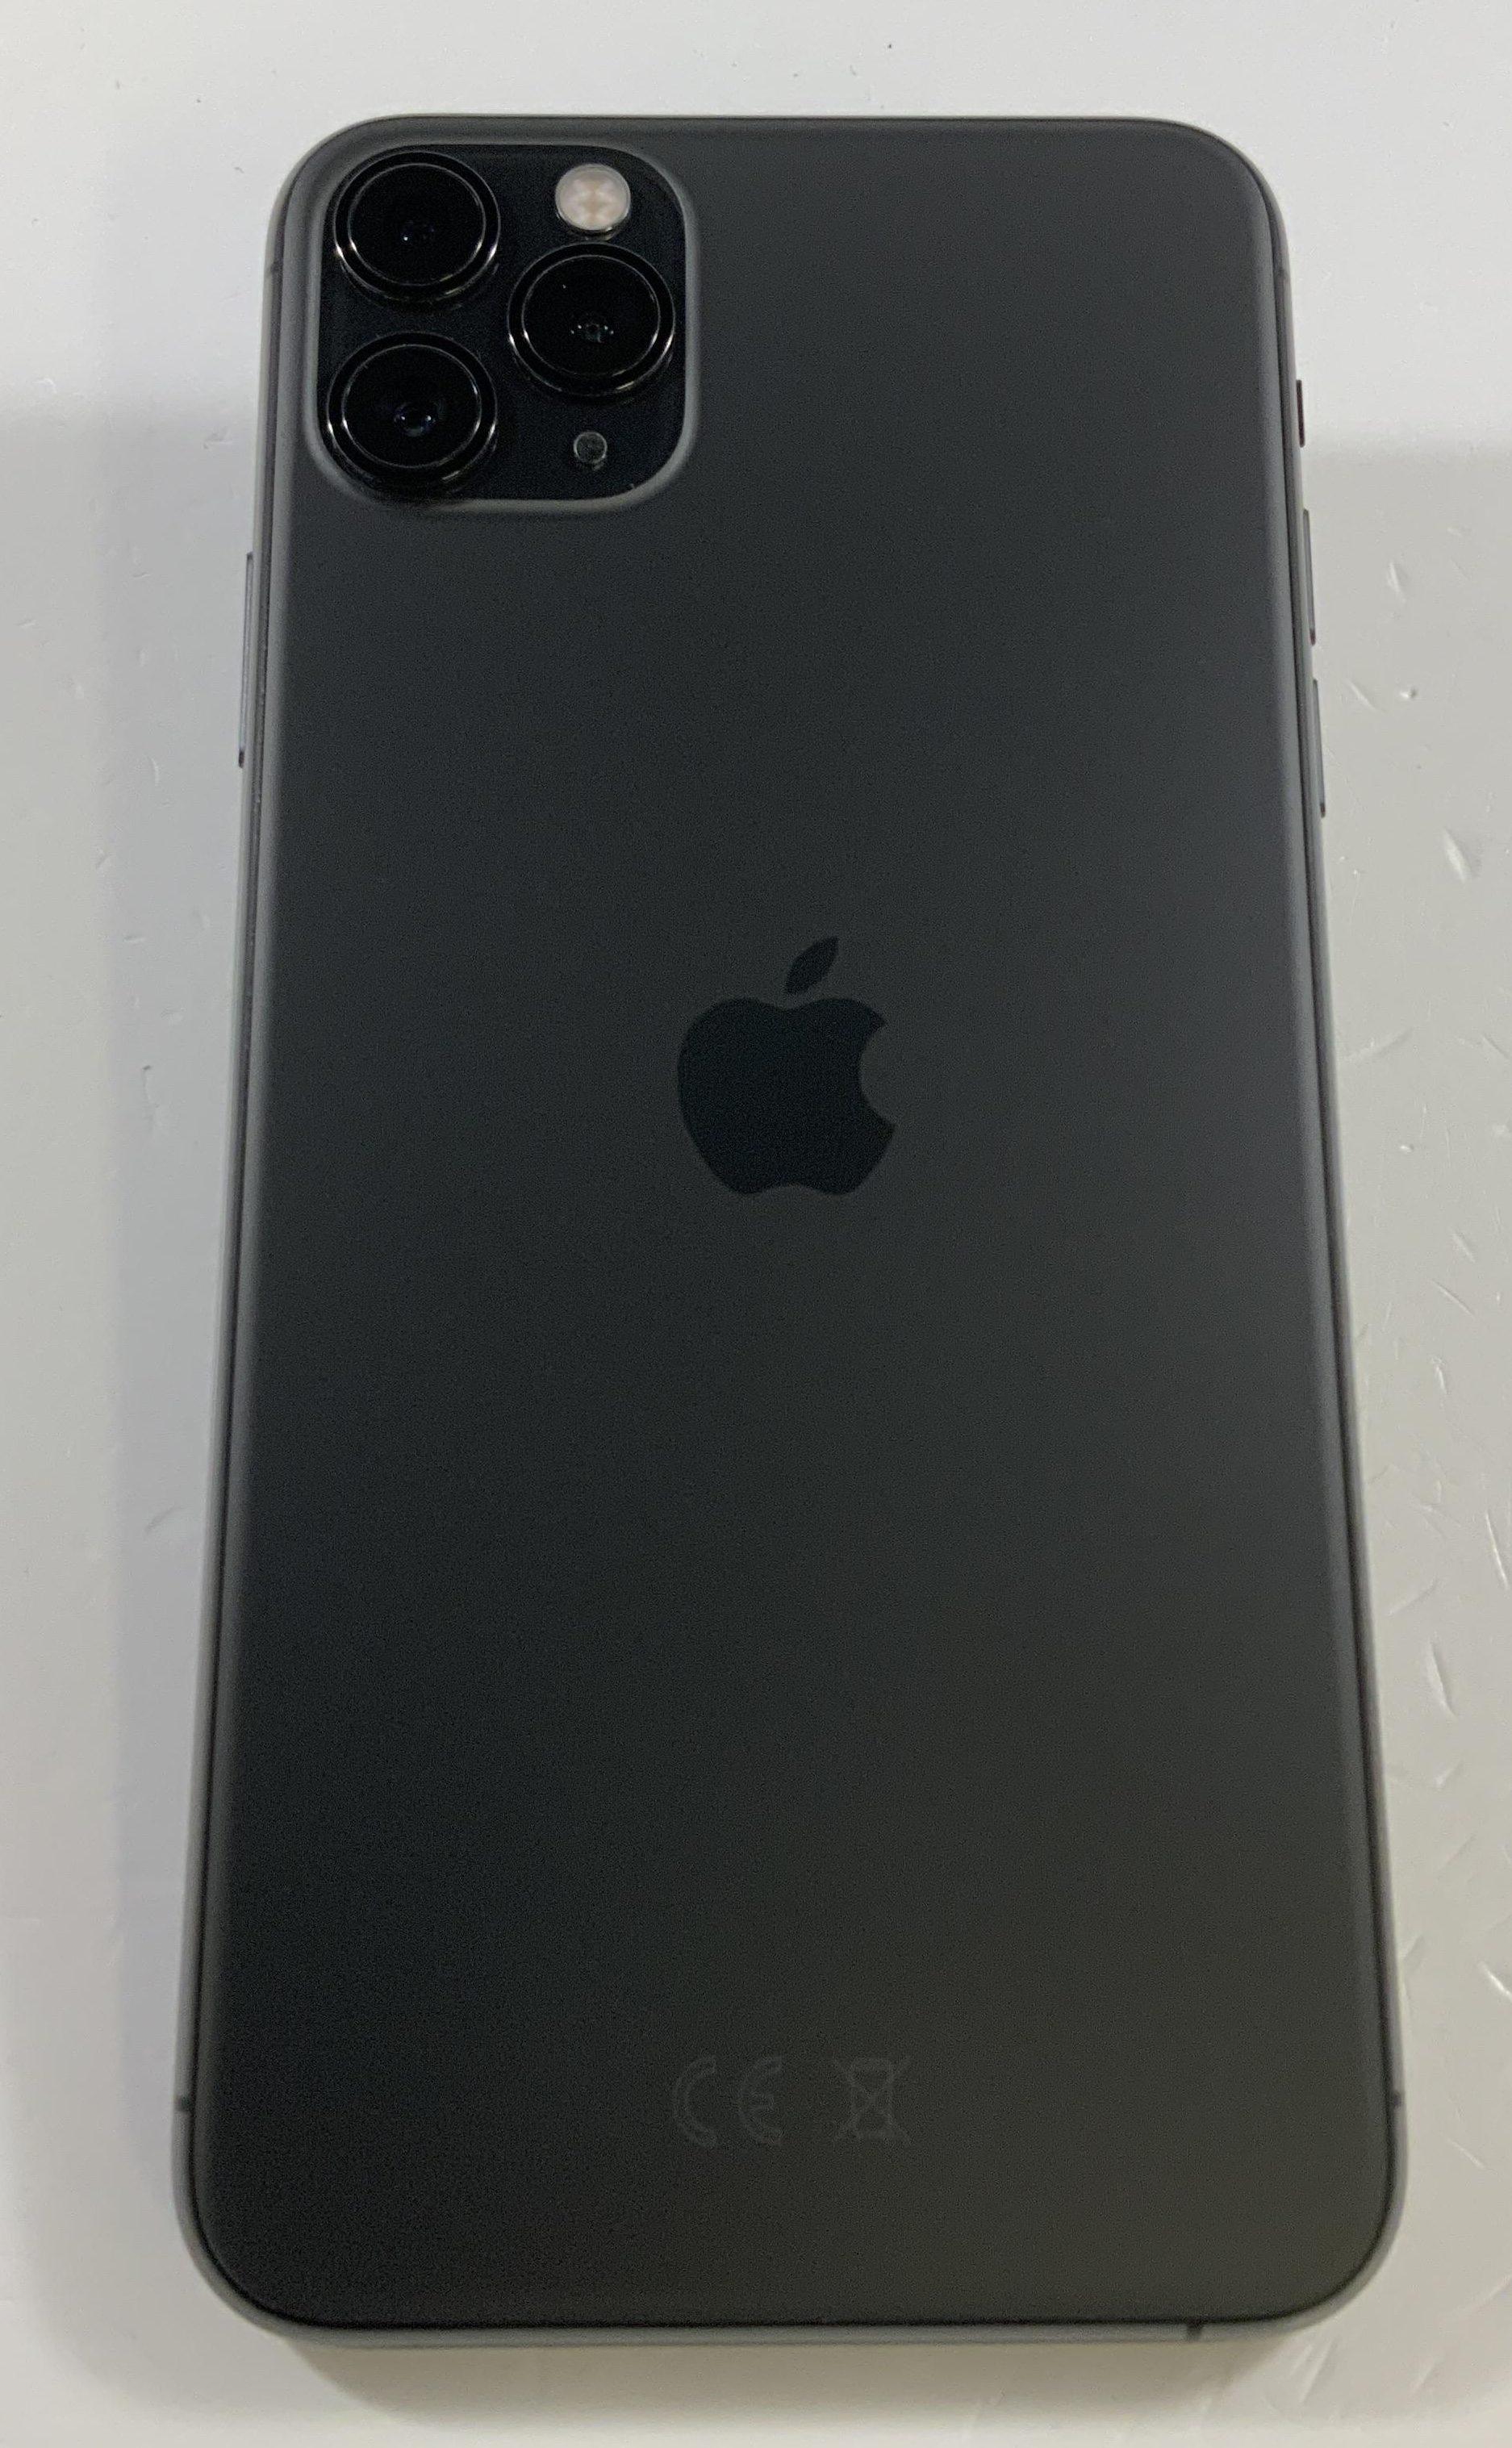 iPhone 11 Pro Max 64GB, 64GB, Space Gray, Bild 2